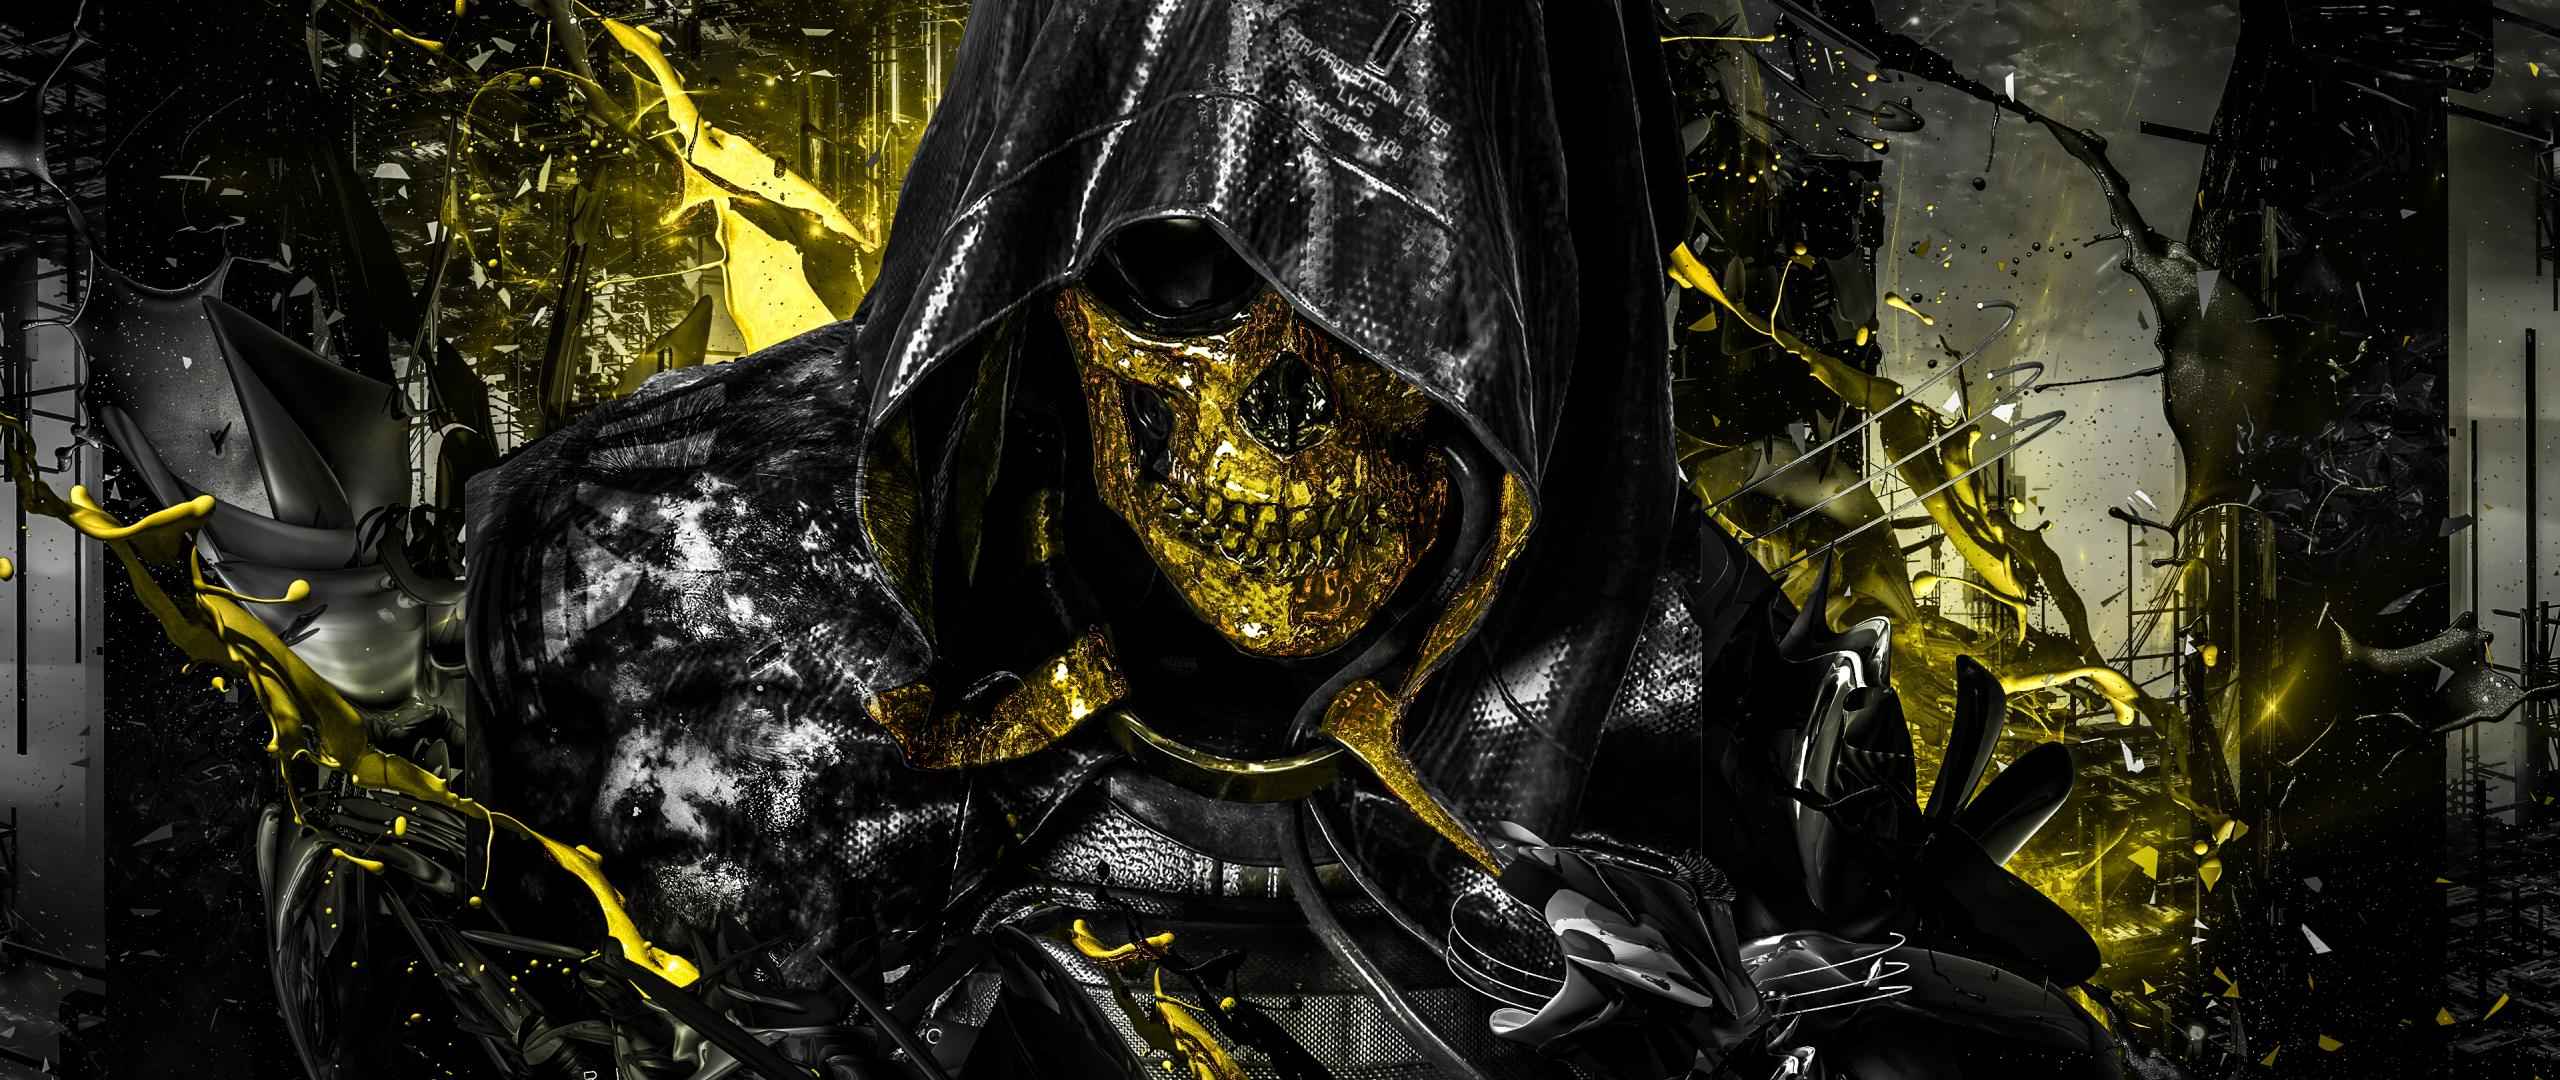 2560x1080 Death Stranding 2019 Game 2560x1080 Resolution ...